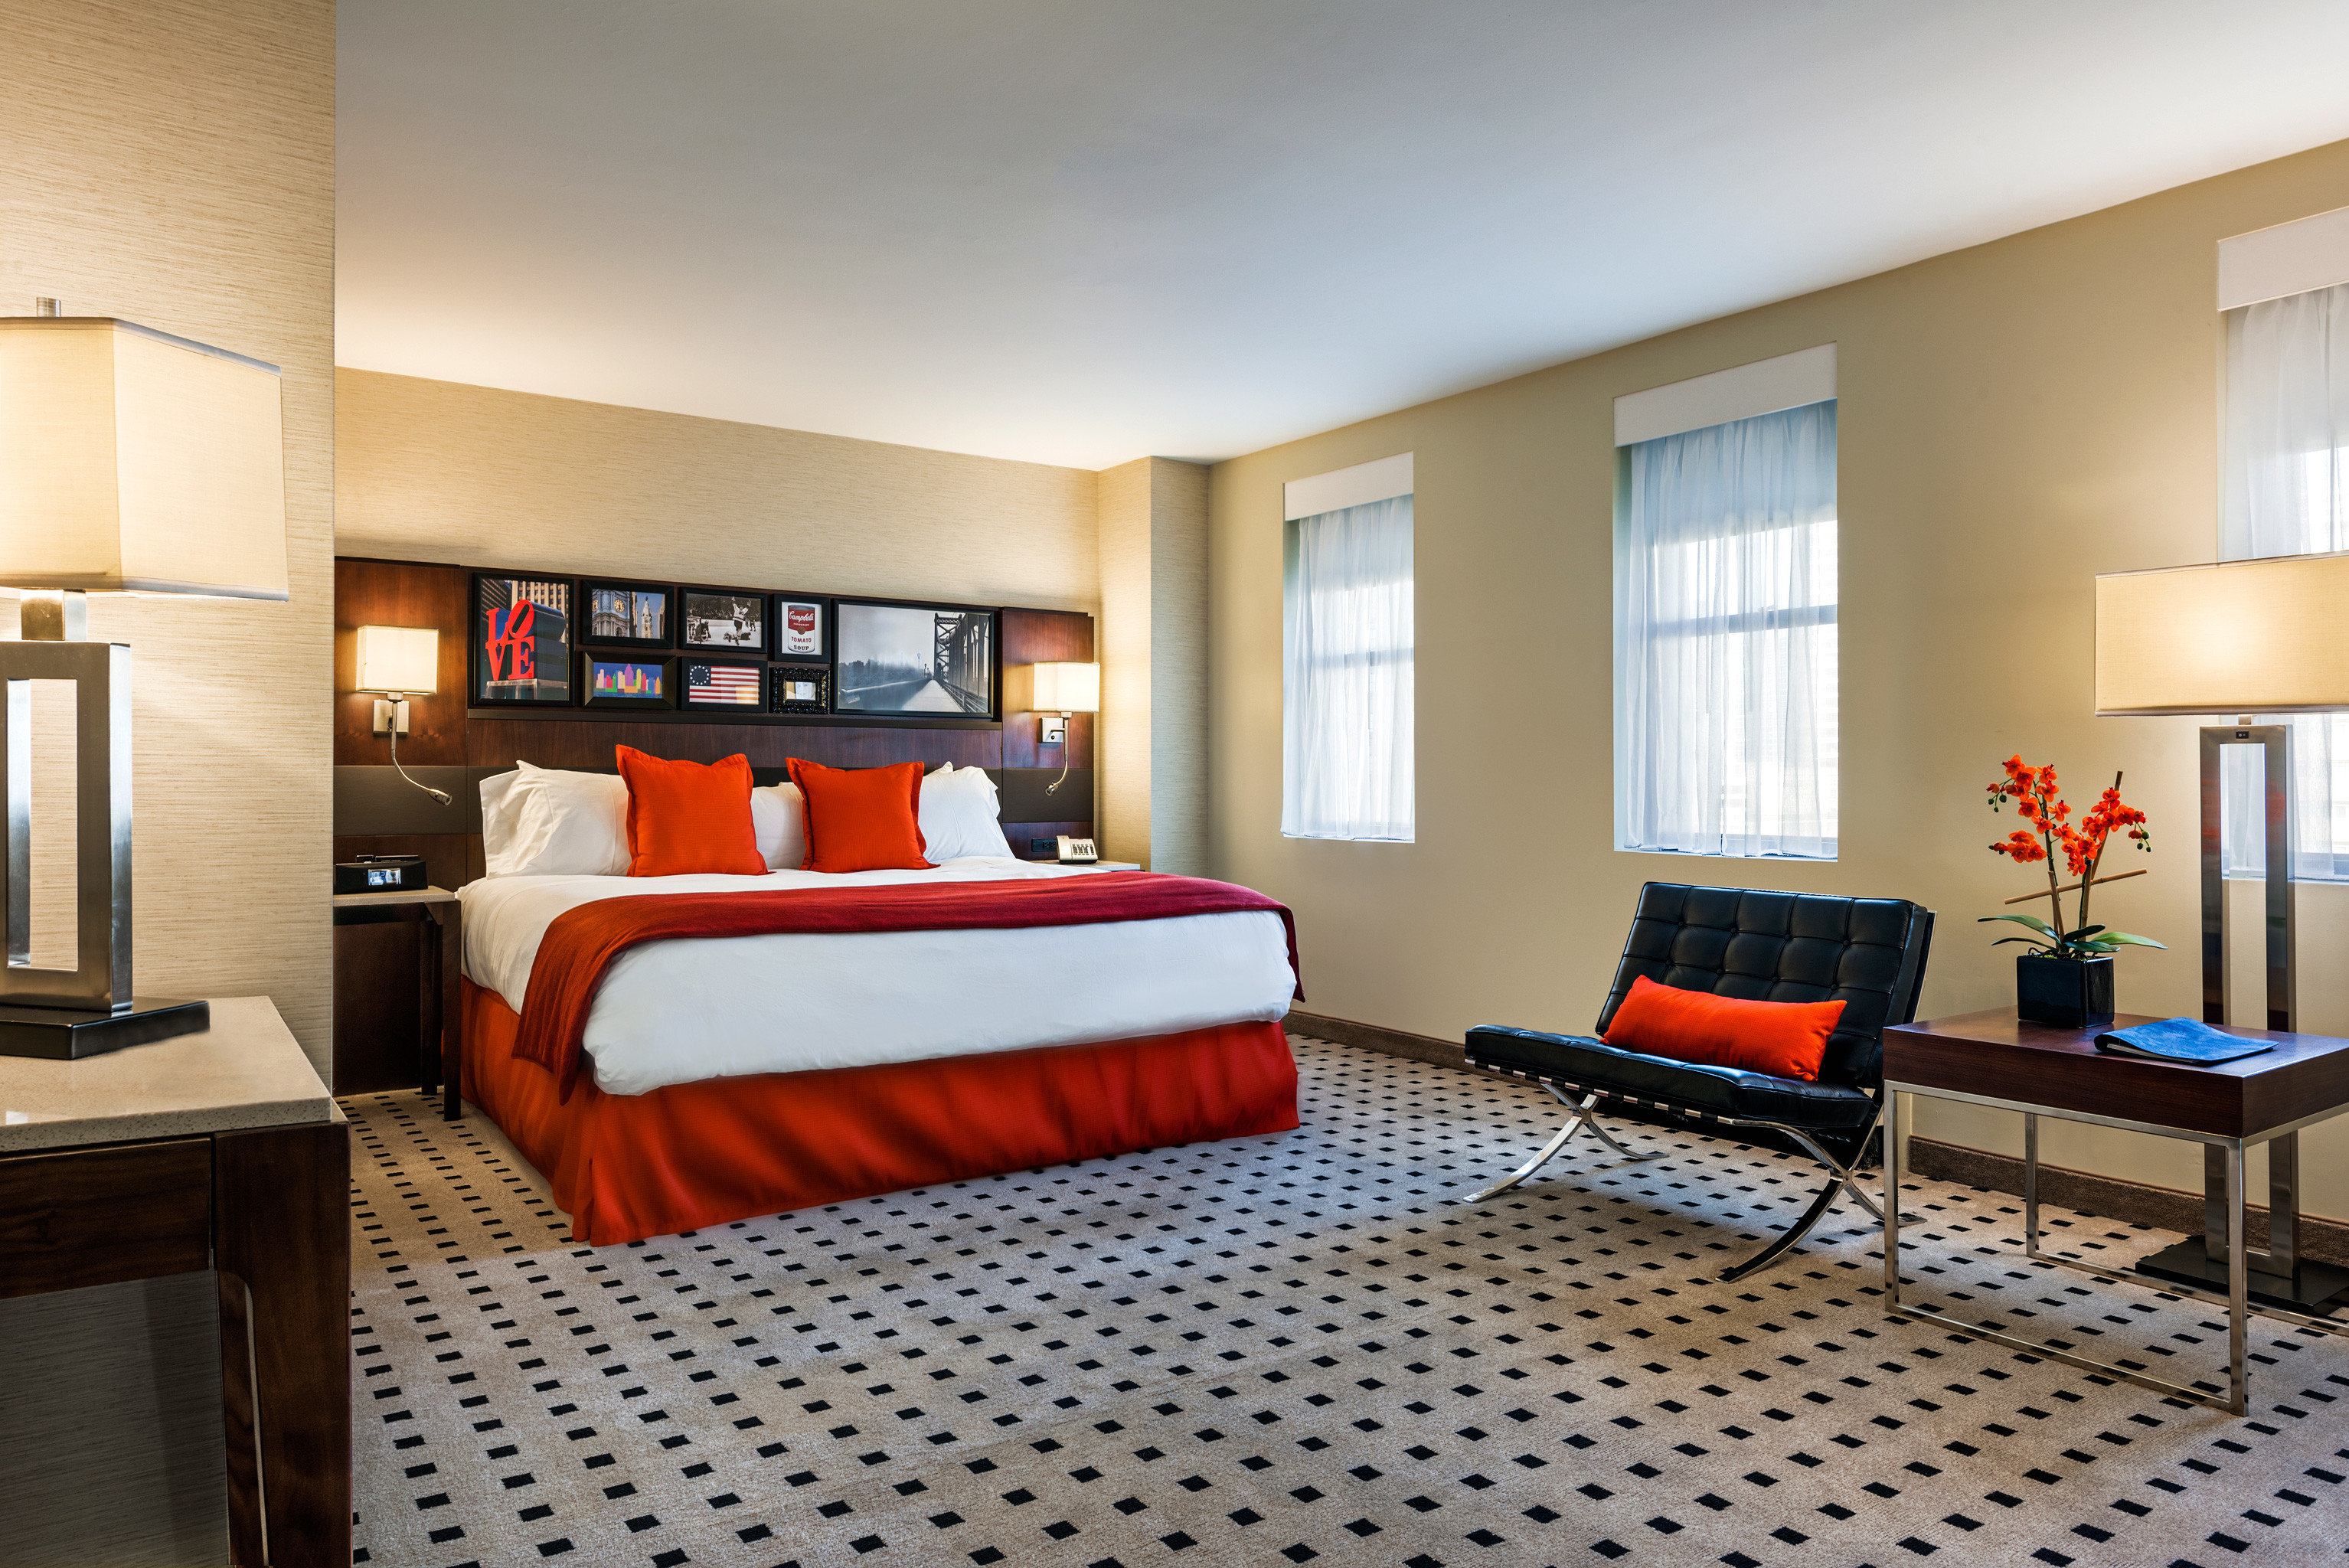 Bedroom Business Modern property condominium Suite living room red hardwood home orange